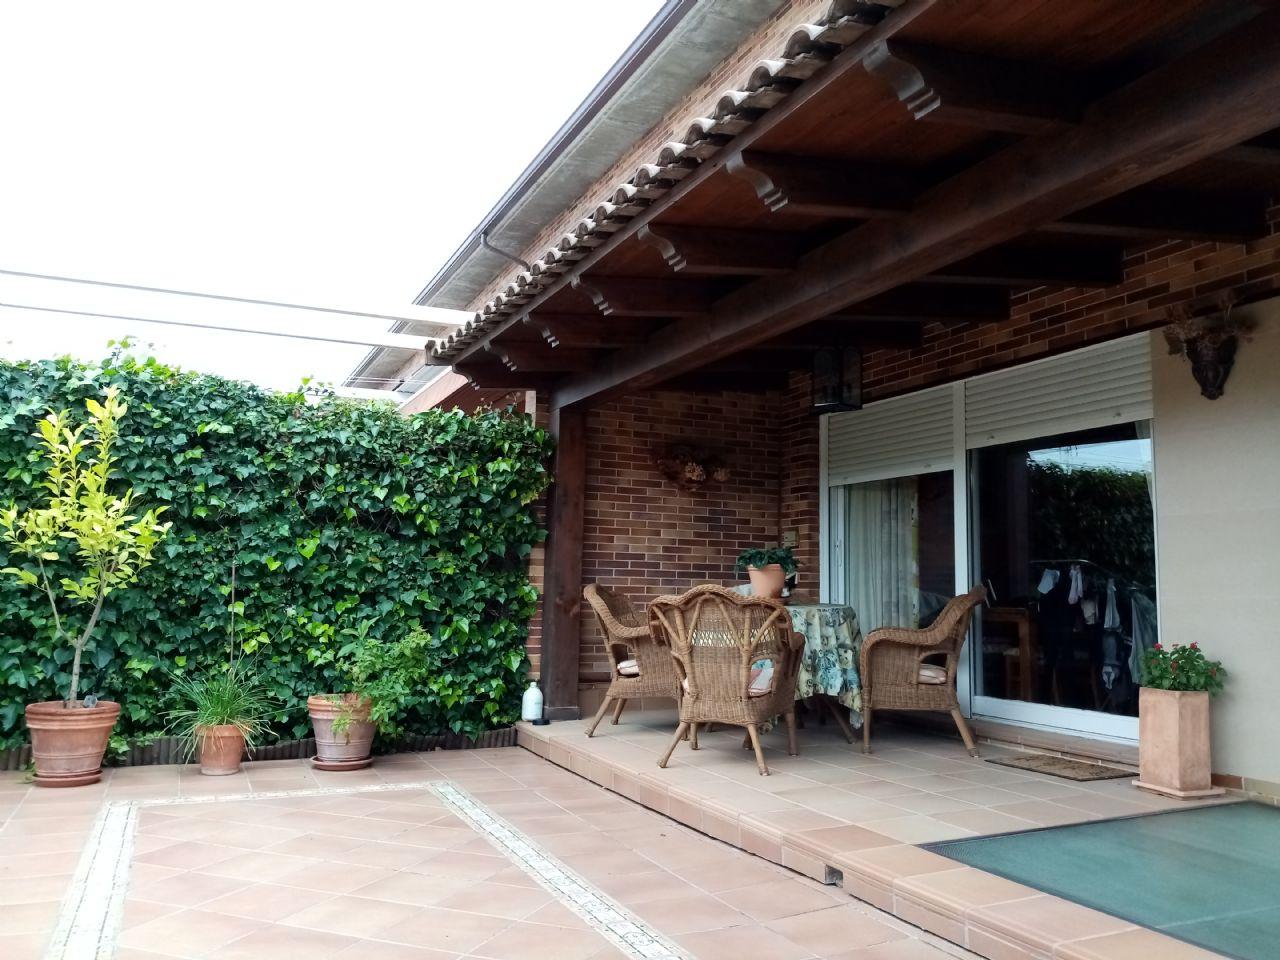 Casa adosada en Valdeolmos-Alalpardo, CASCO URBANO RESIDENCIAL, venta